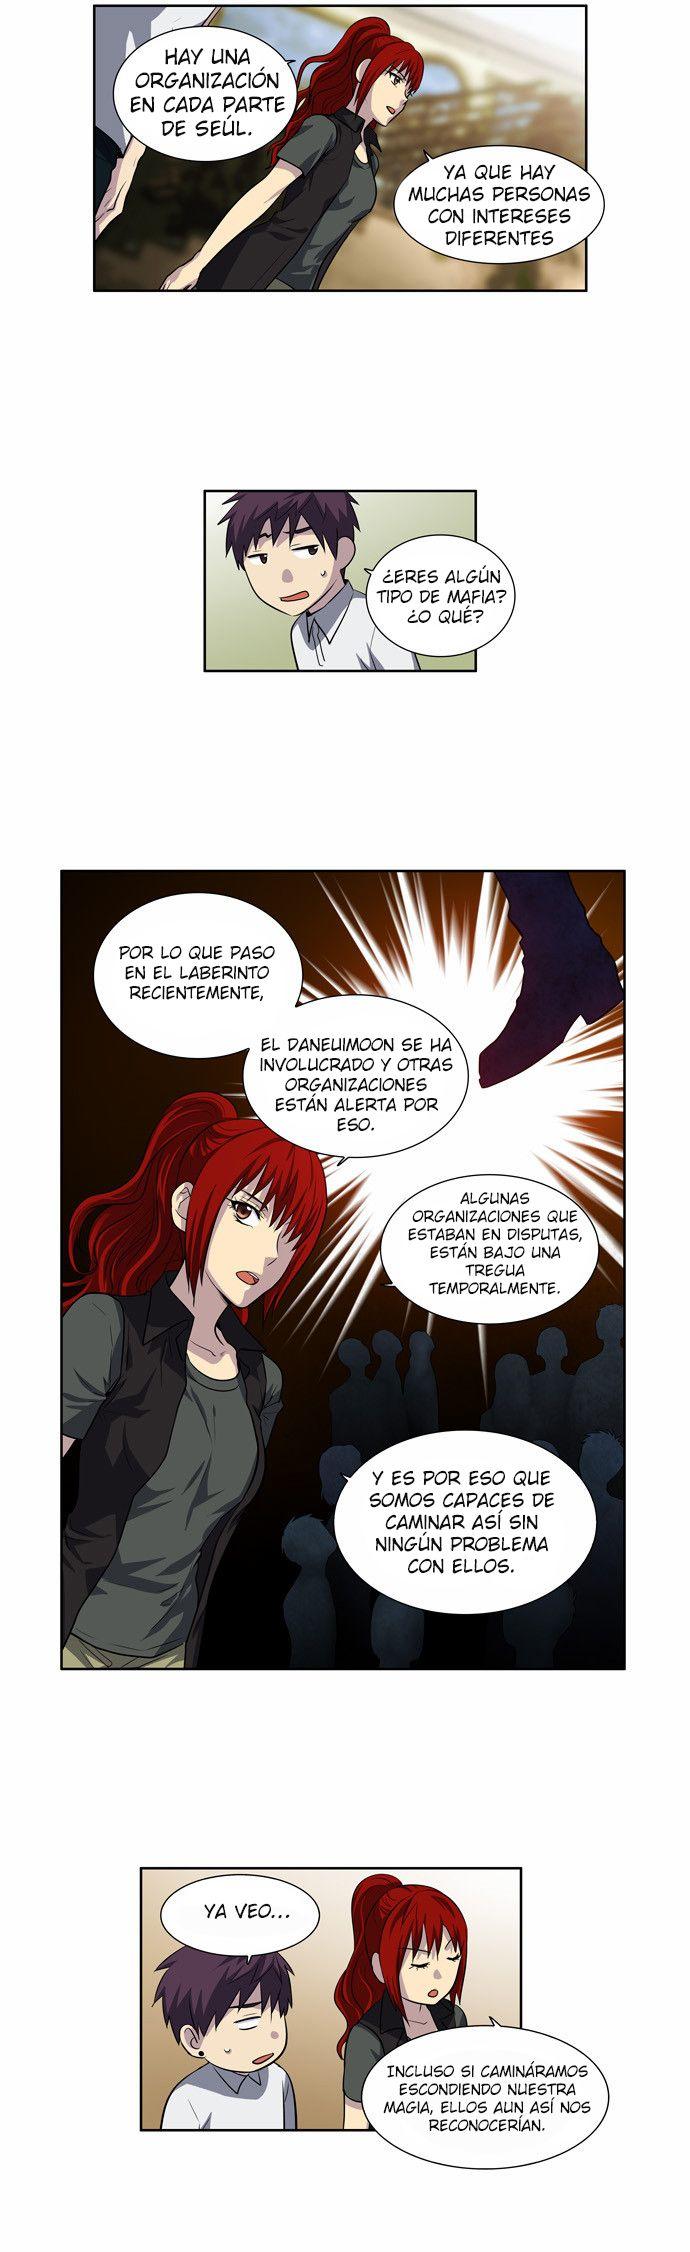 https://c5.ninemanga.com/es_manga/61/1725/478207/b24877075cc69ad3634b9b7a5e51de96.jpg Page 5